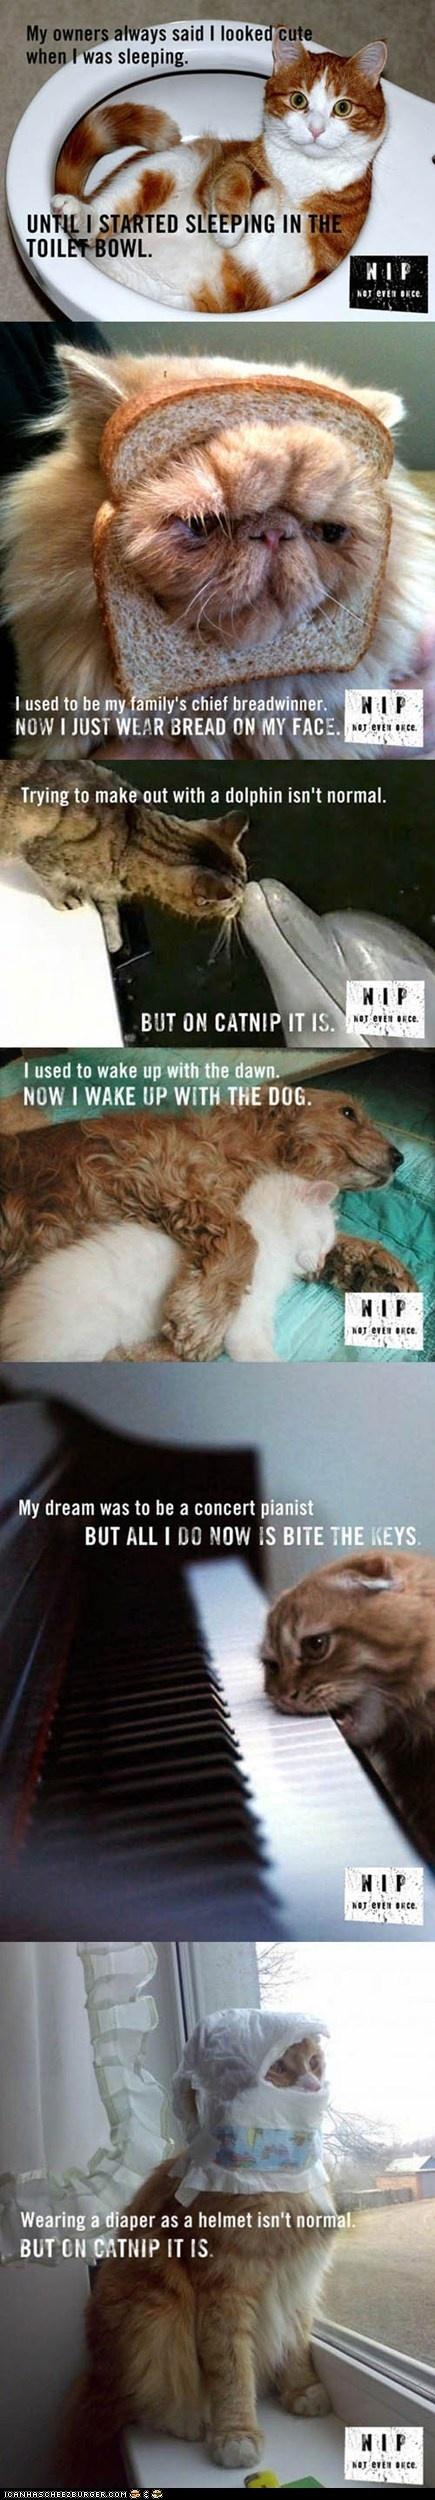 Catnip...not even once!: Animal Pics, Funny Kitty, Catnip Not, Cat Funny, Funny Cat, Funny Pictures, Funny Stuff, I Love Cat, Catnip Propaganda